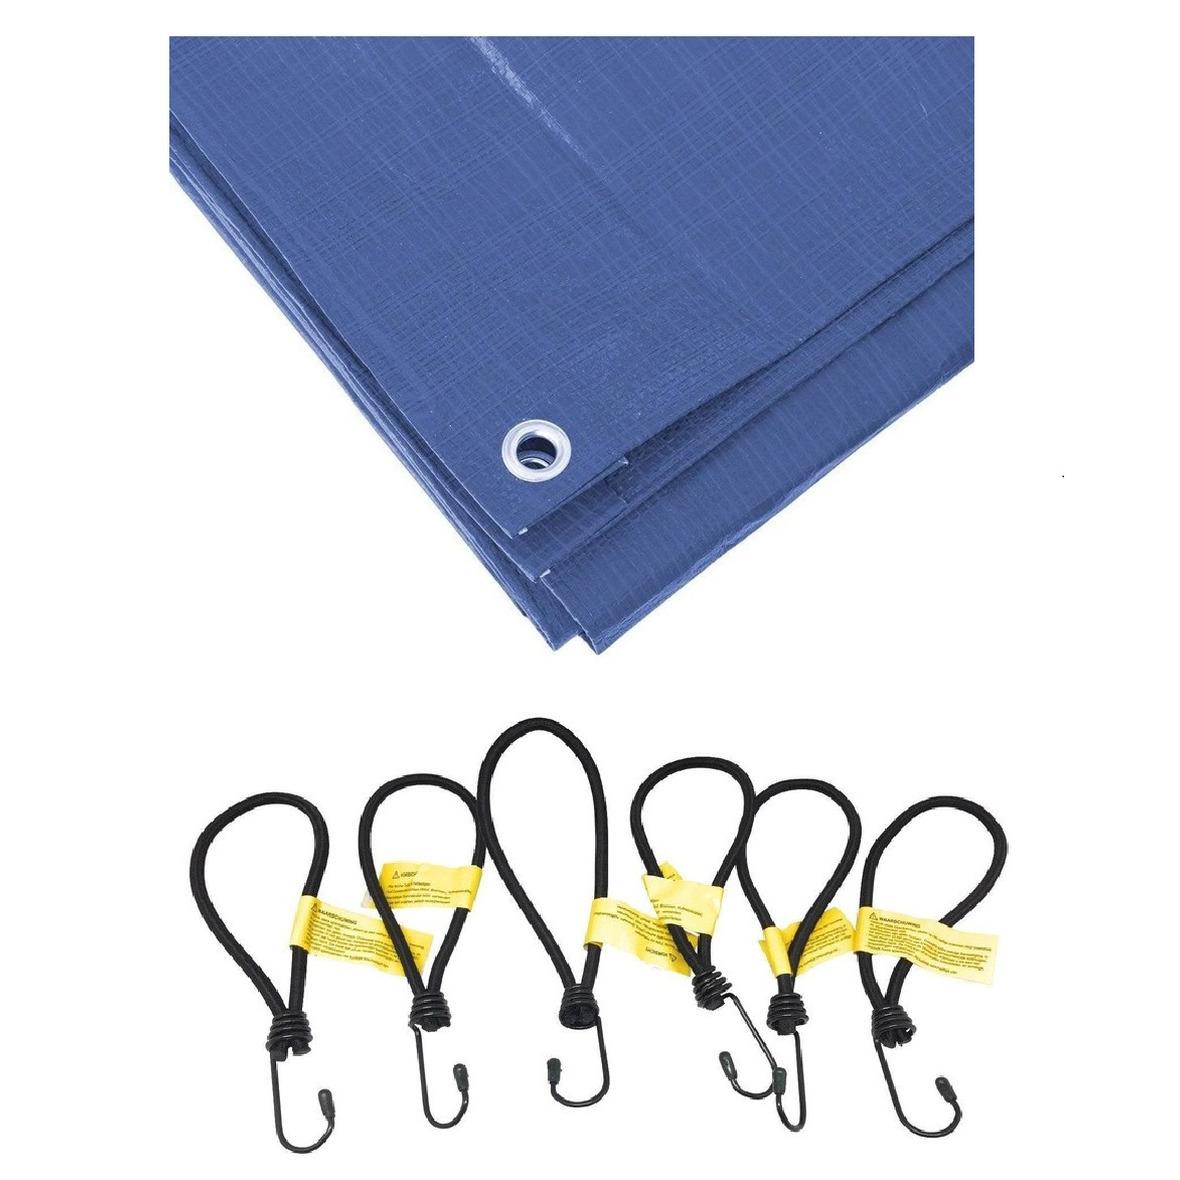 Blauw afdekzeil dekzeil 2 x 3 meter met 12x spanners haakjes